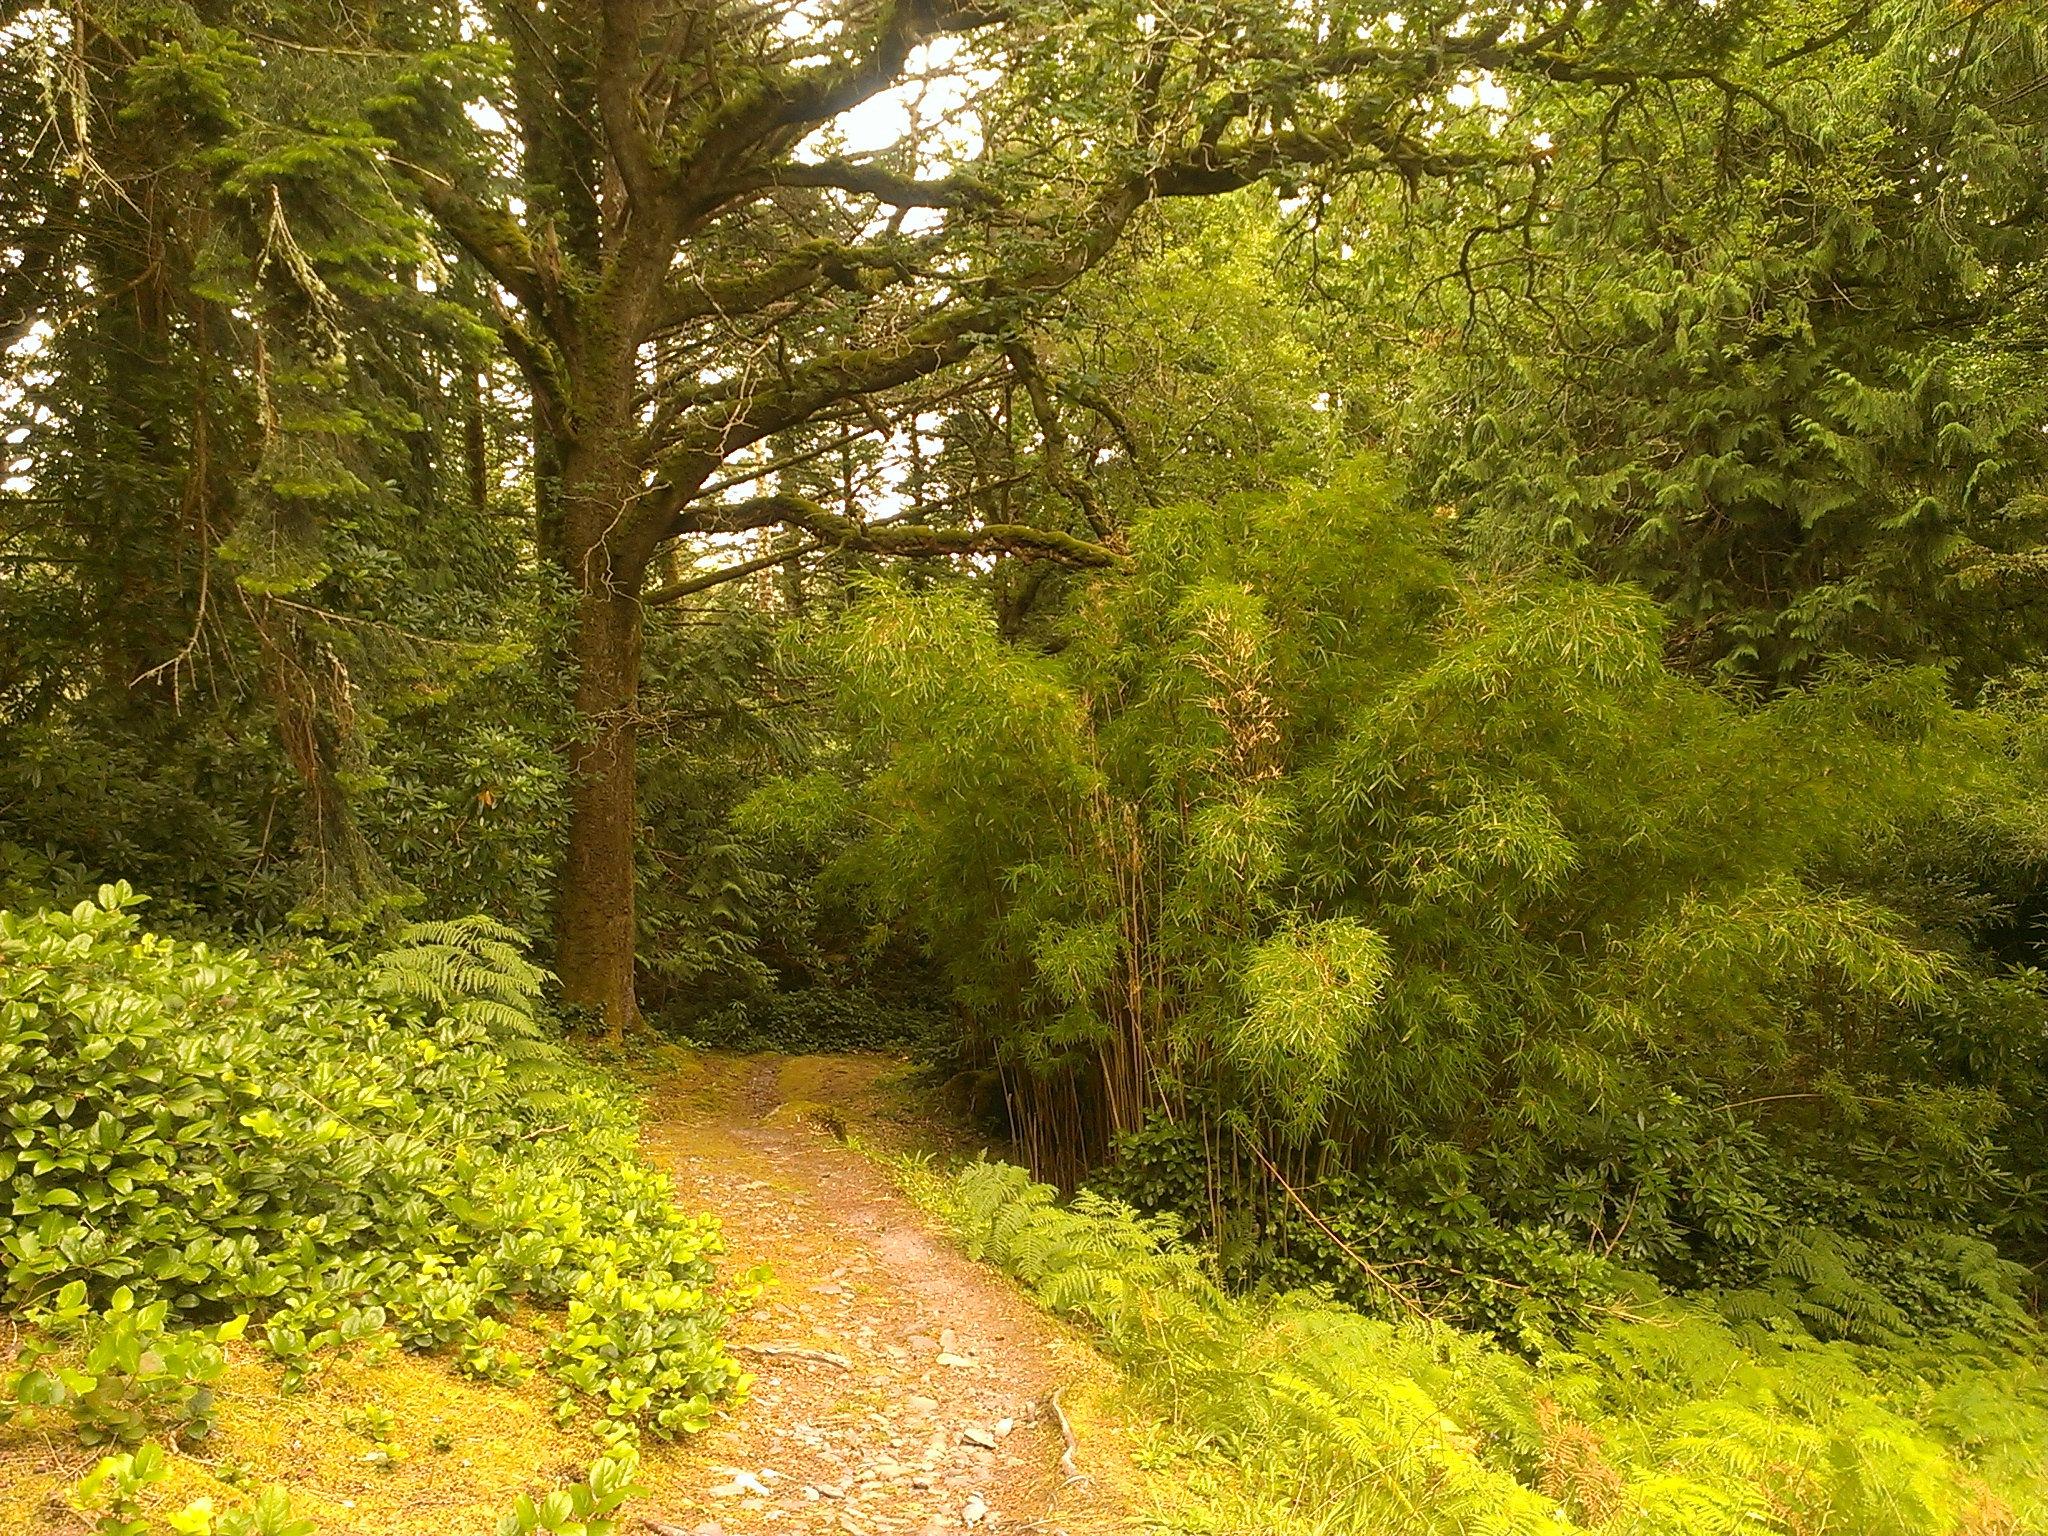 derreen gardens kenmare